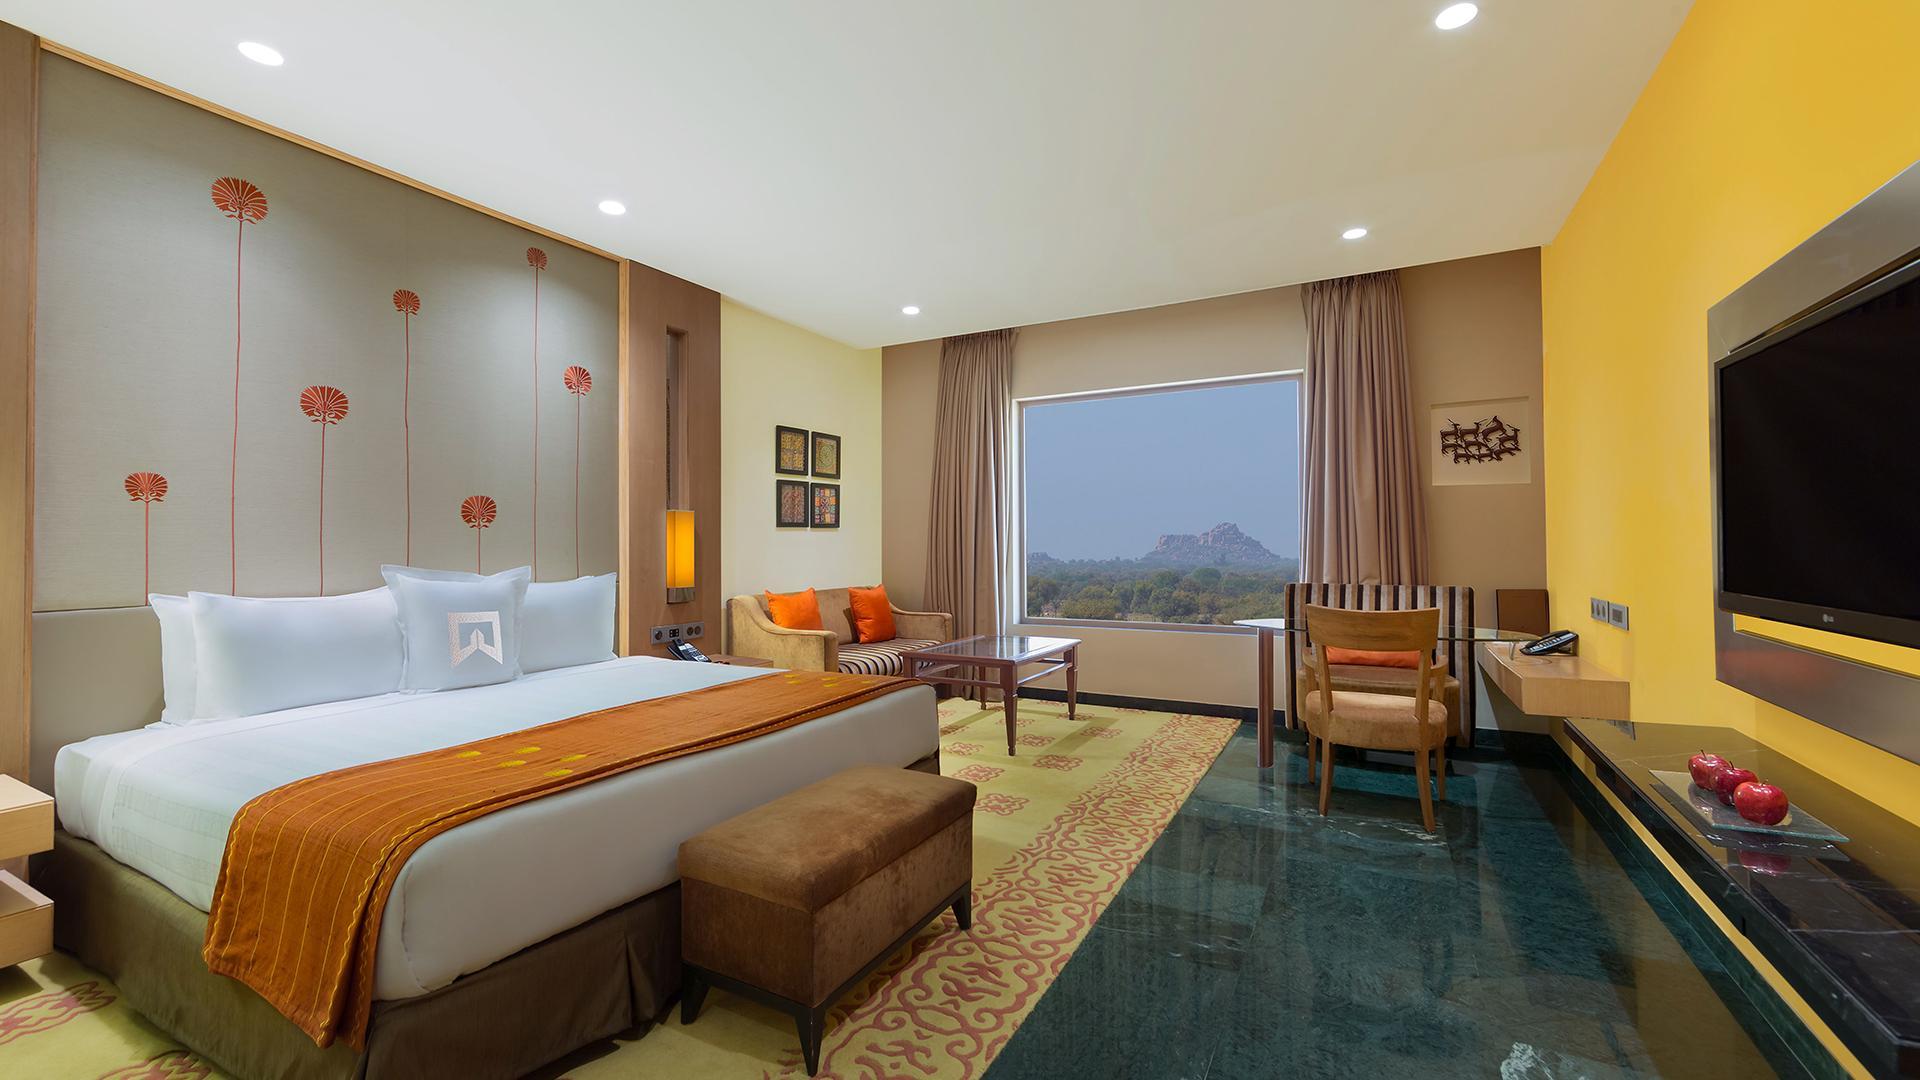 Jodhpur Chambers Room image 1 at Welcomhotel Jodhpur by Jodhpur, Rajasthan, India